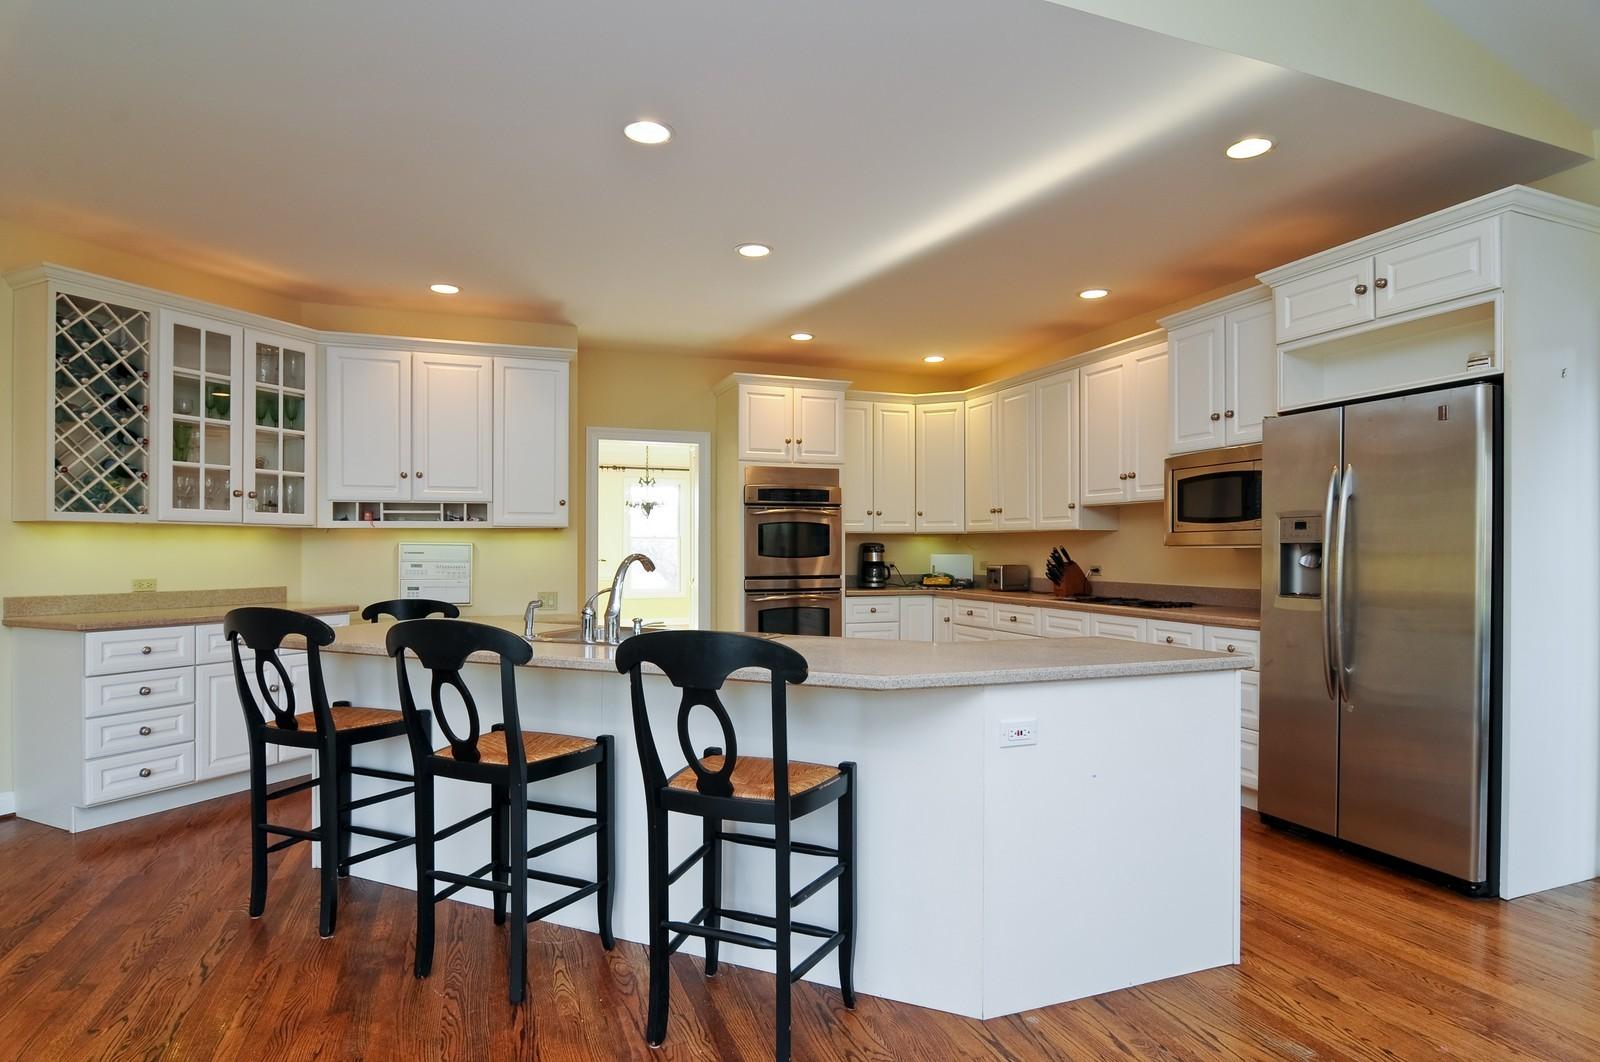 Real Estate Photography - 2091 Trenton, Libertyville, IL, 60048 - Kitchen